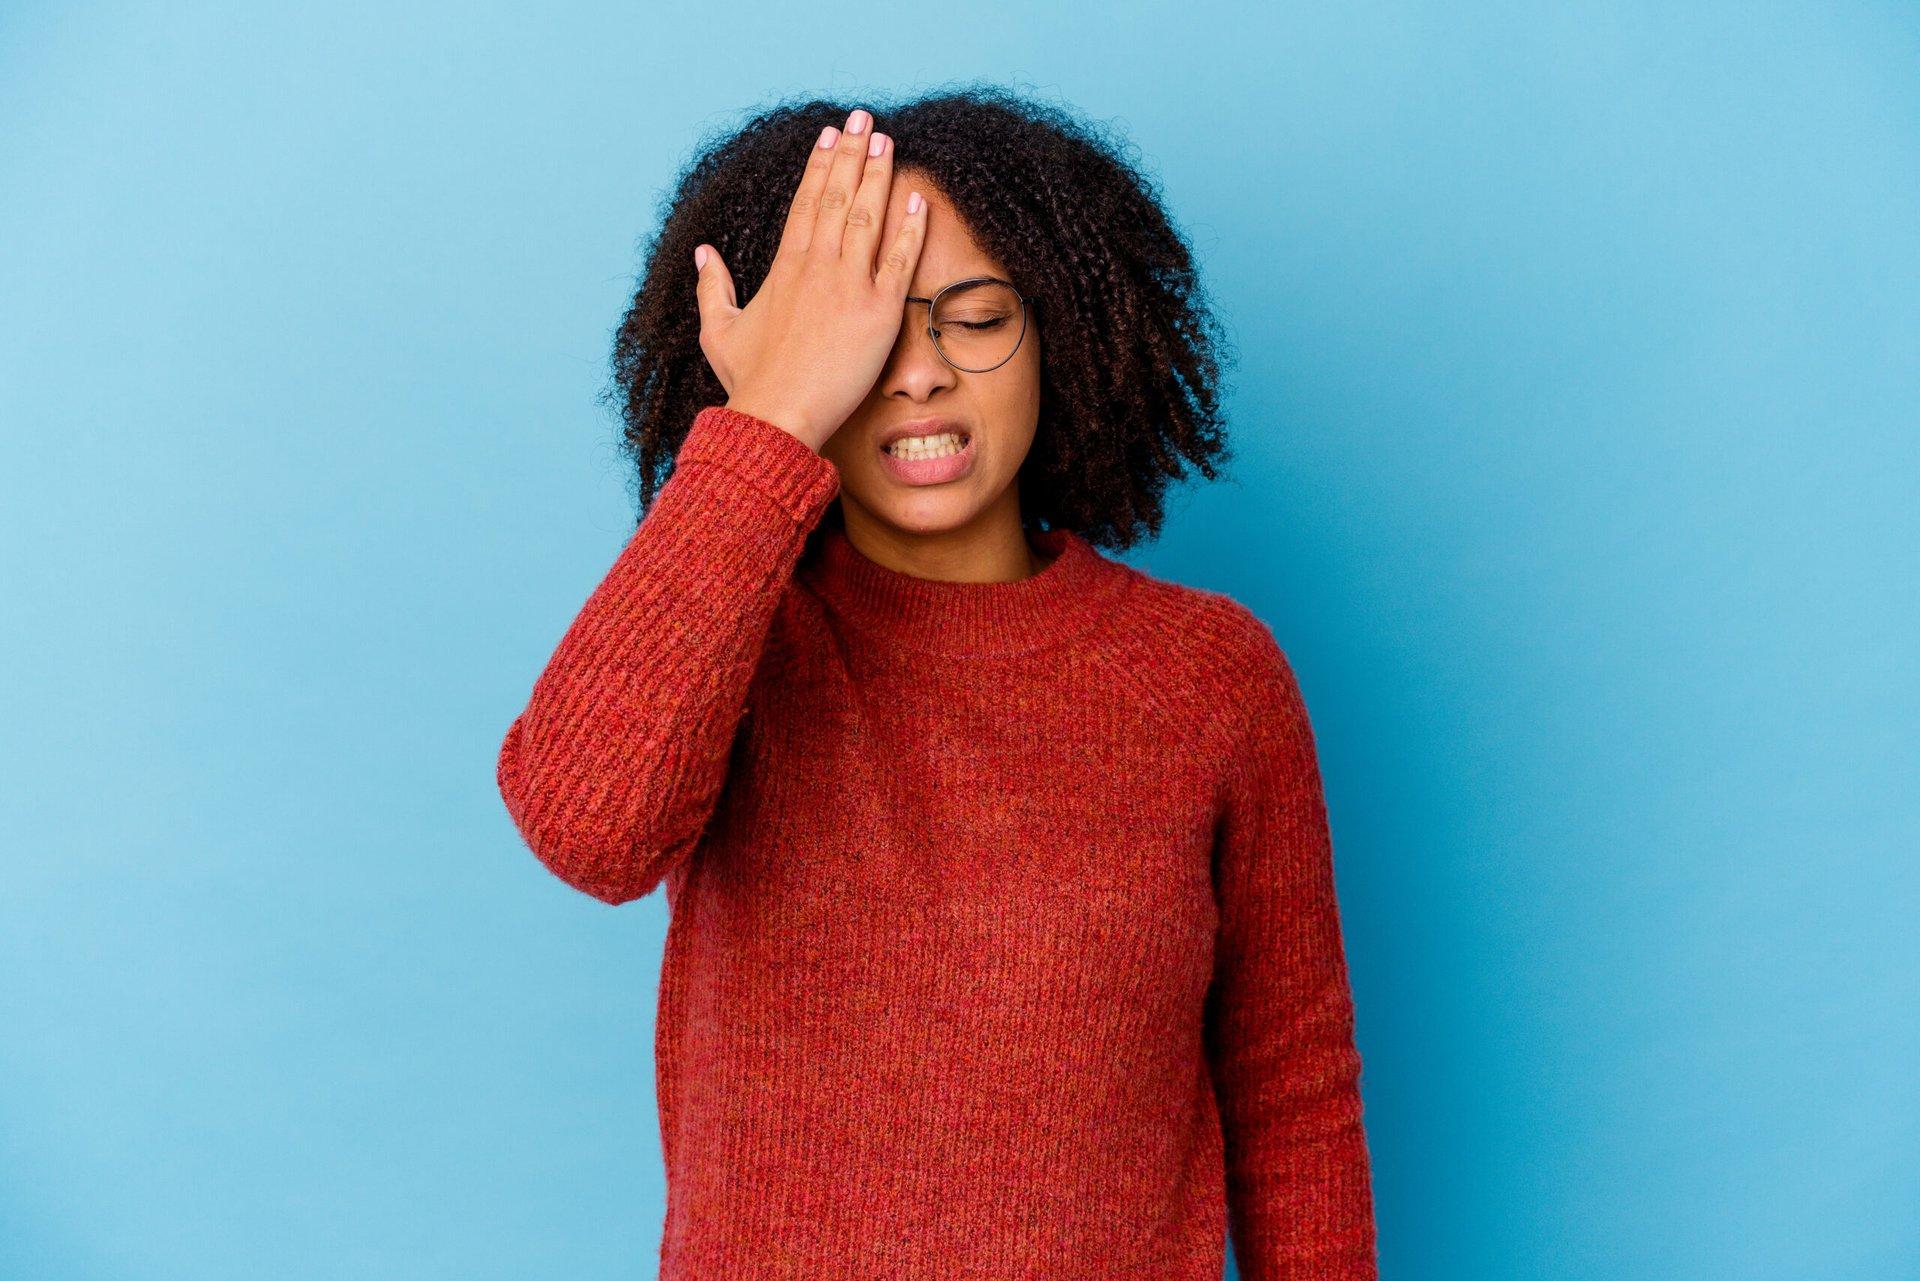 Woman slapping forehead